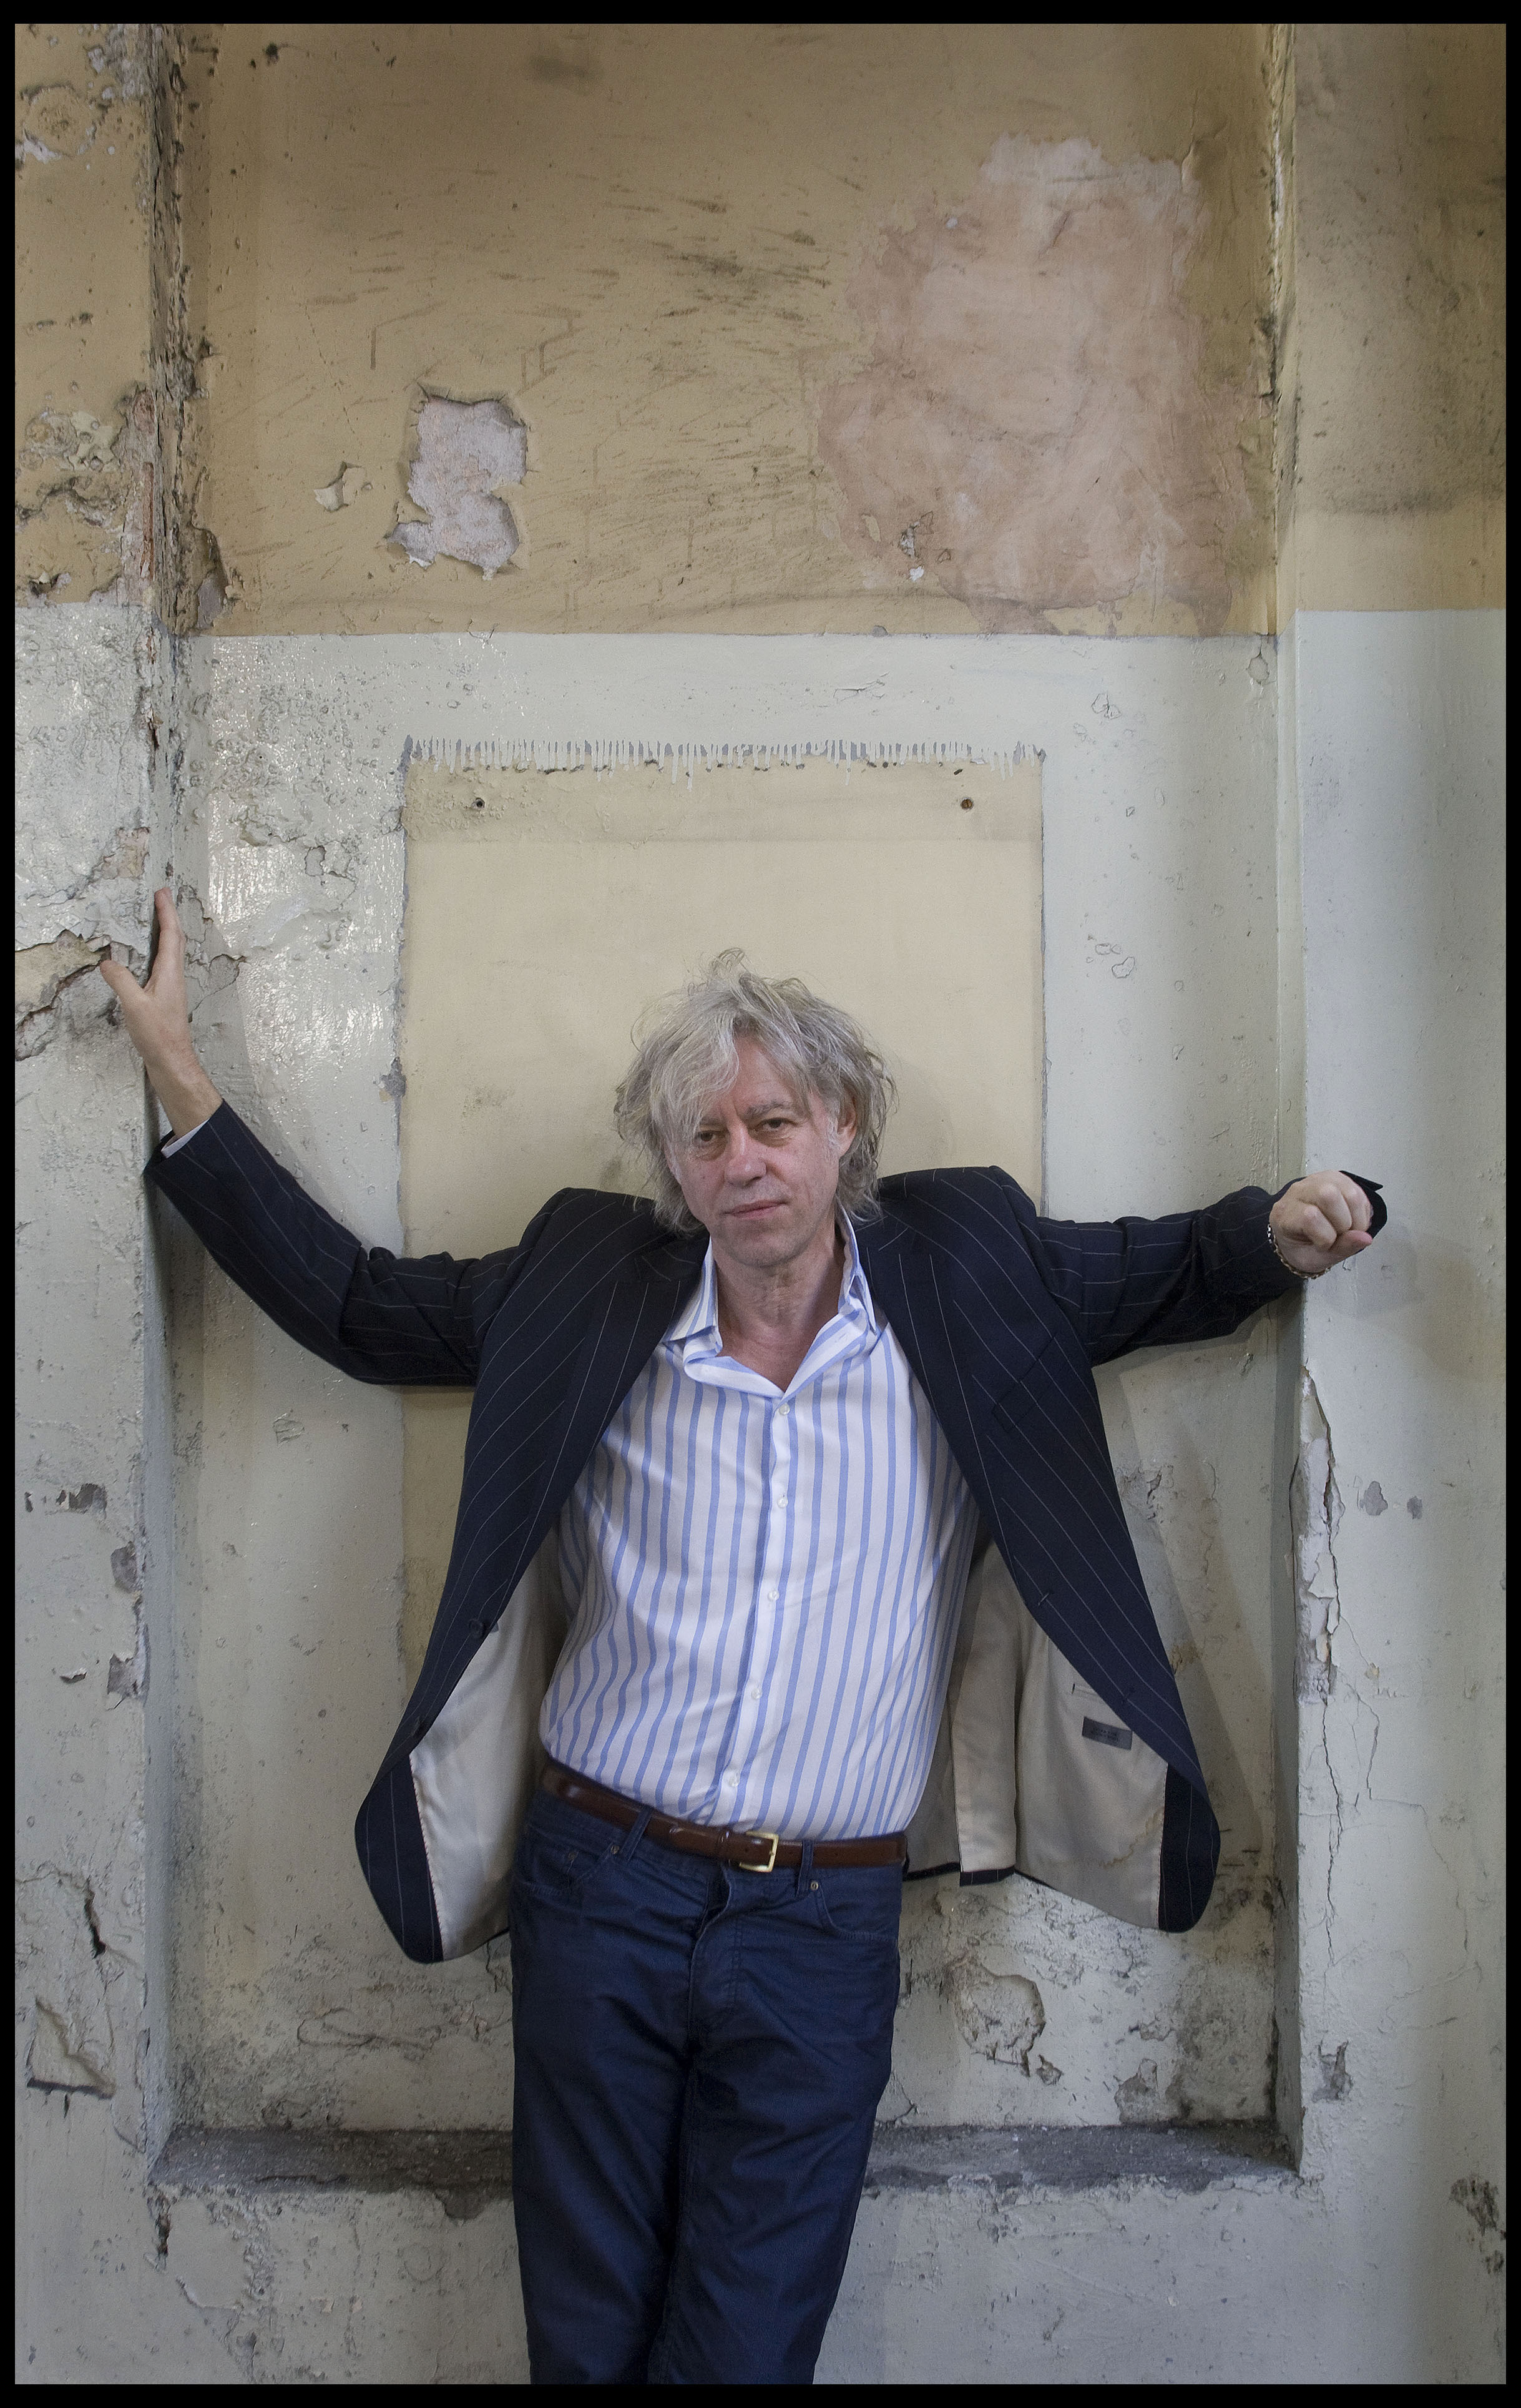 Sir Bob Geldof, political activist, musician